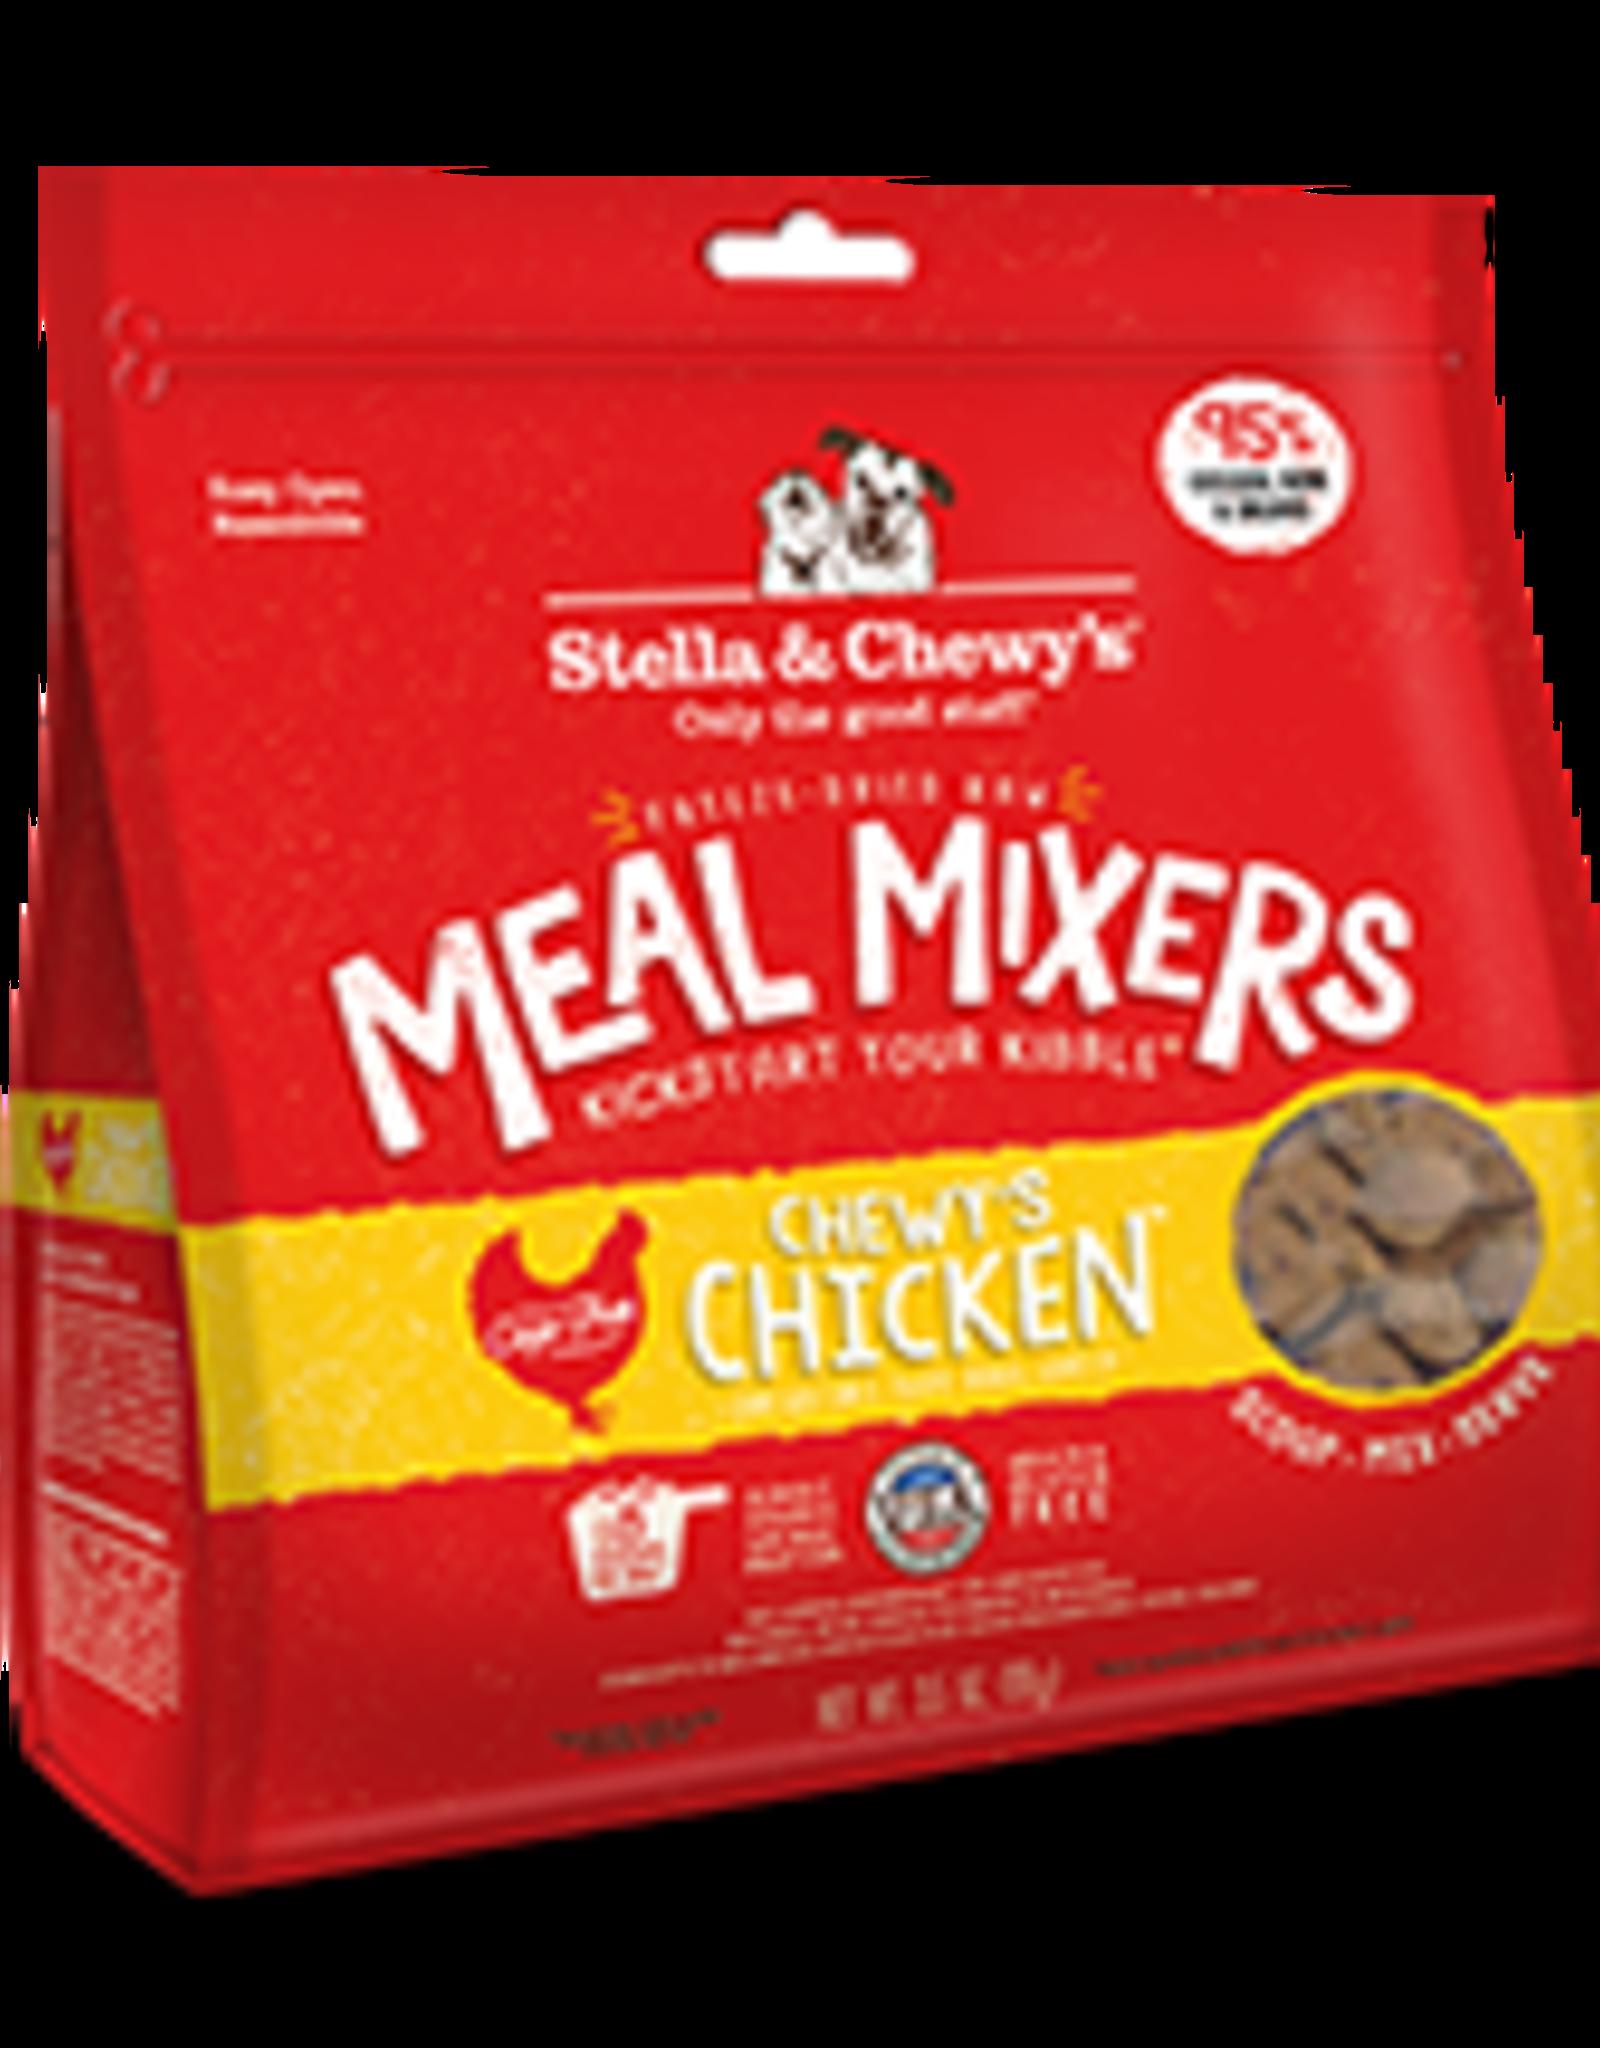 Stella & Chewys Meal Mixers - Chicken 3.5oz